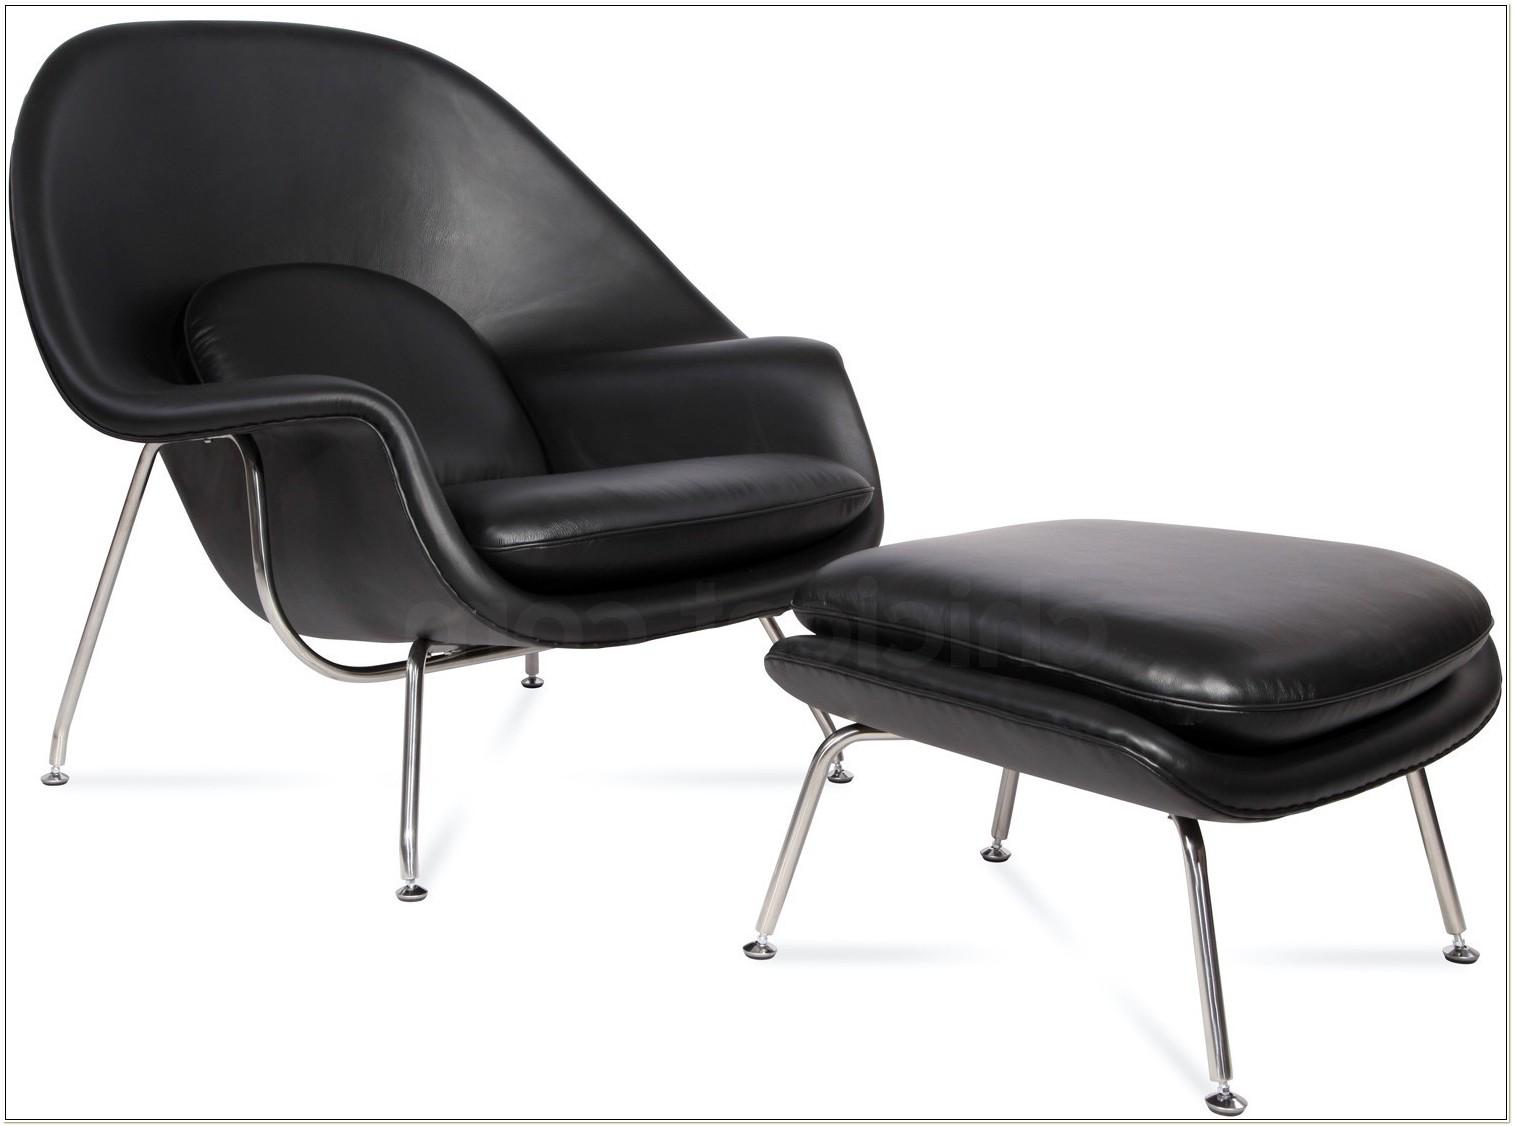 Replica Eero Saarinen Womb Chair And Ottoman